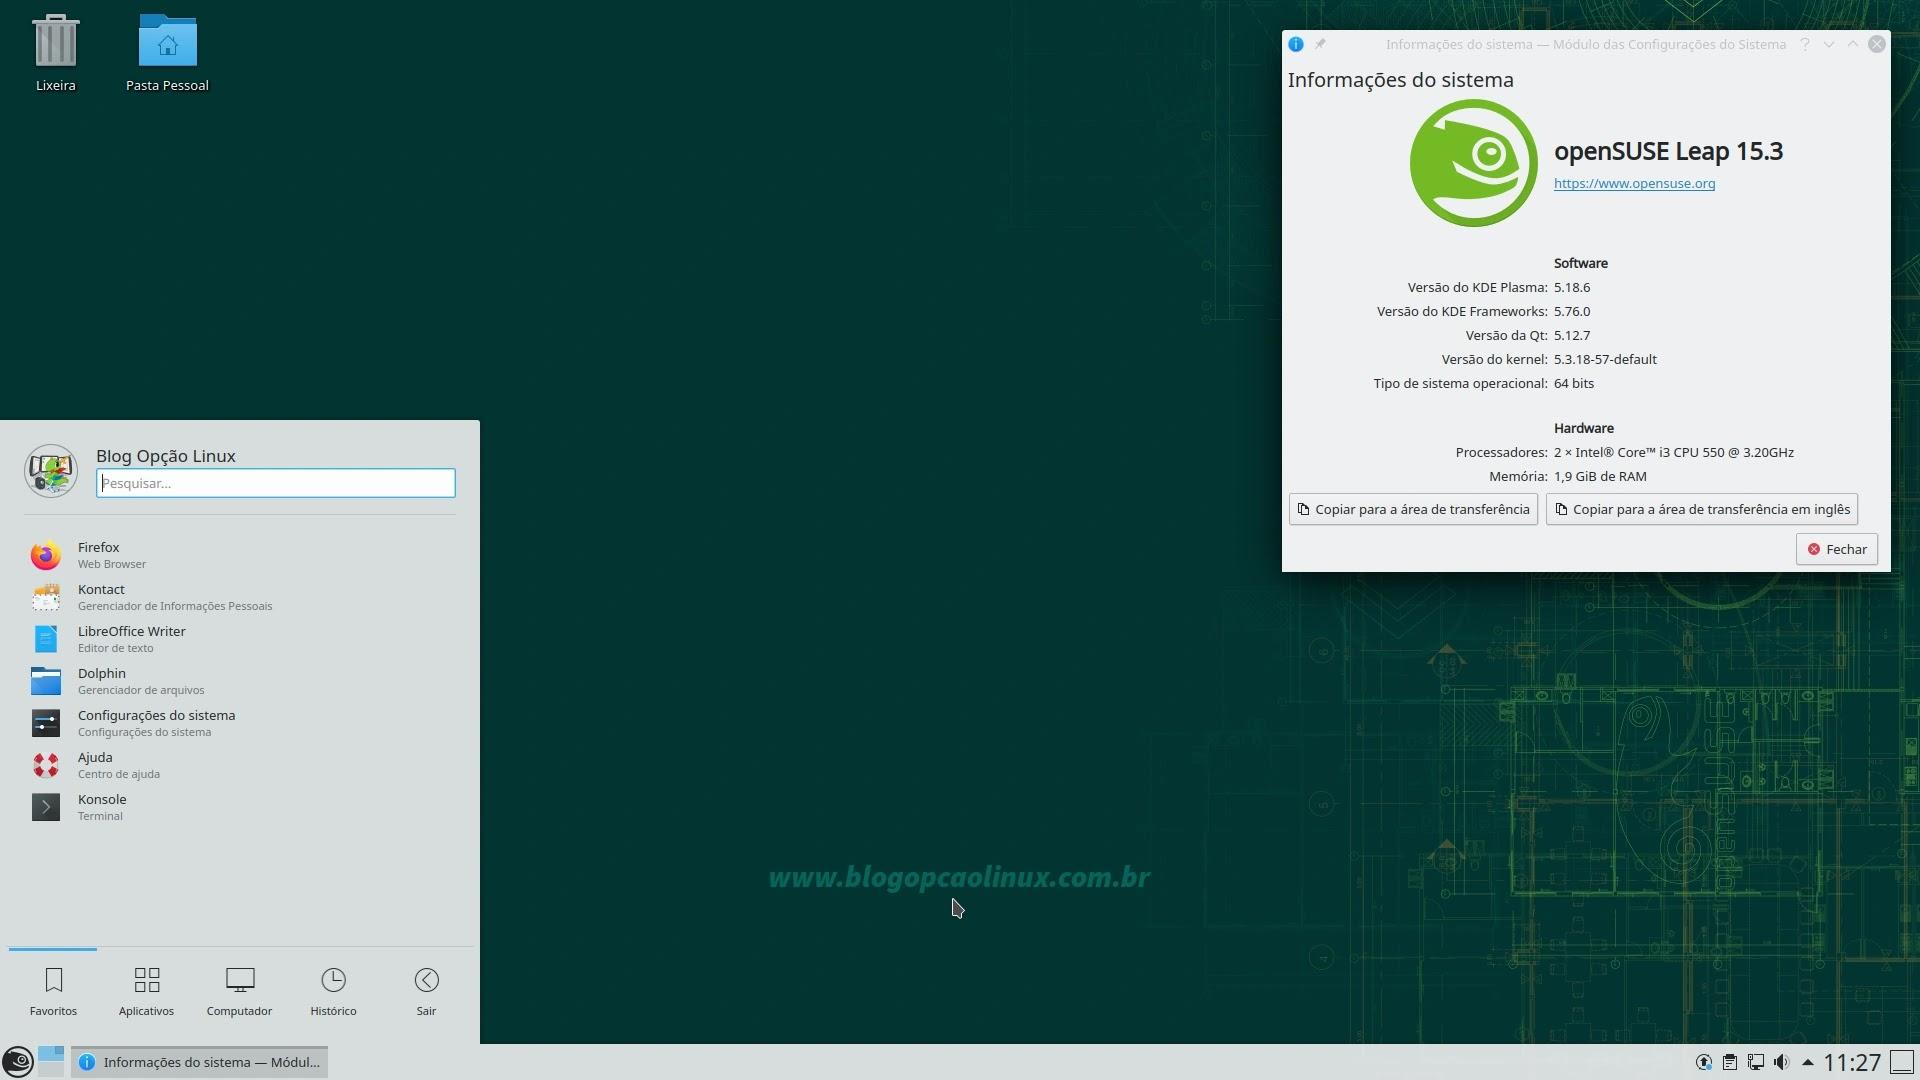 openSUSE Leap 15.3 com o desktop KDE Plasma 5.18.6 LTS